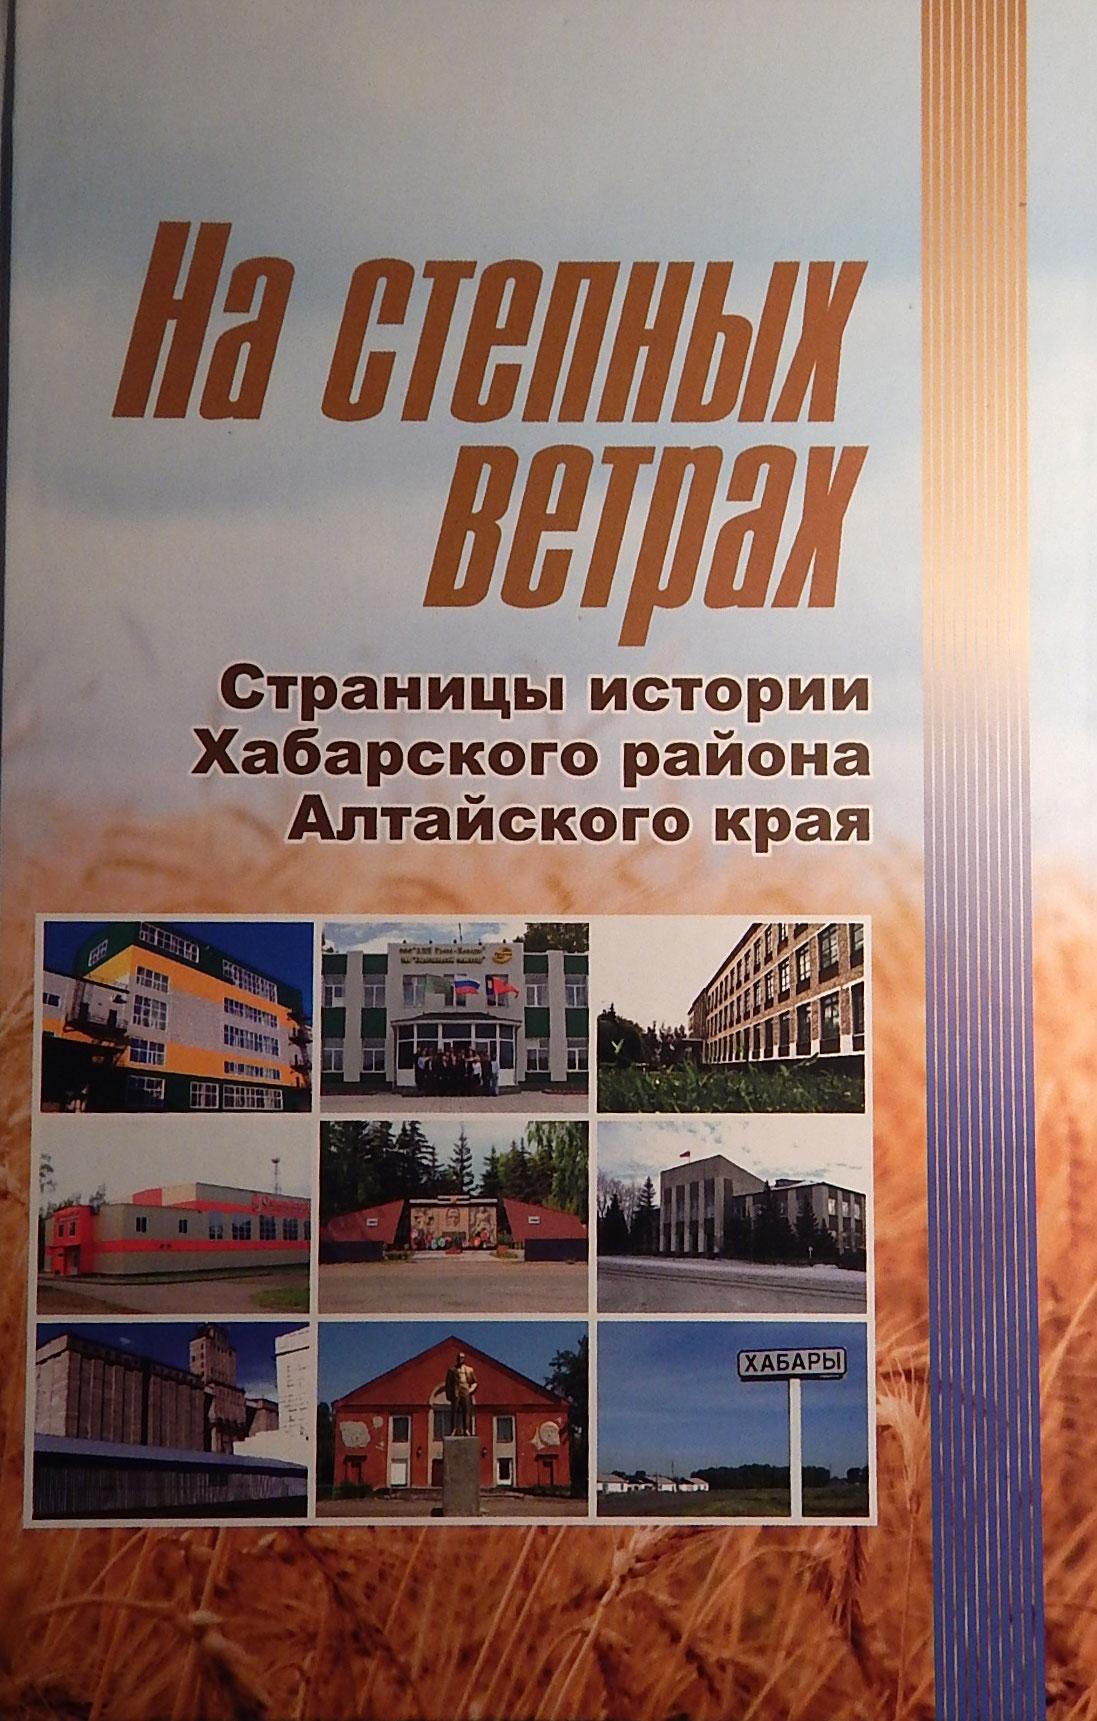 Знакомства Хабарский Район Алтайского Края